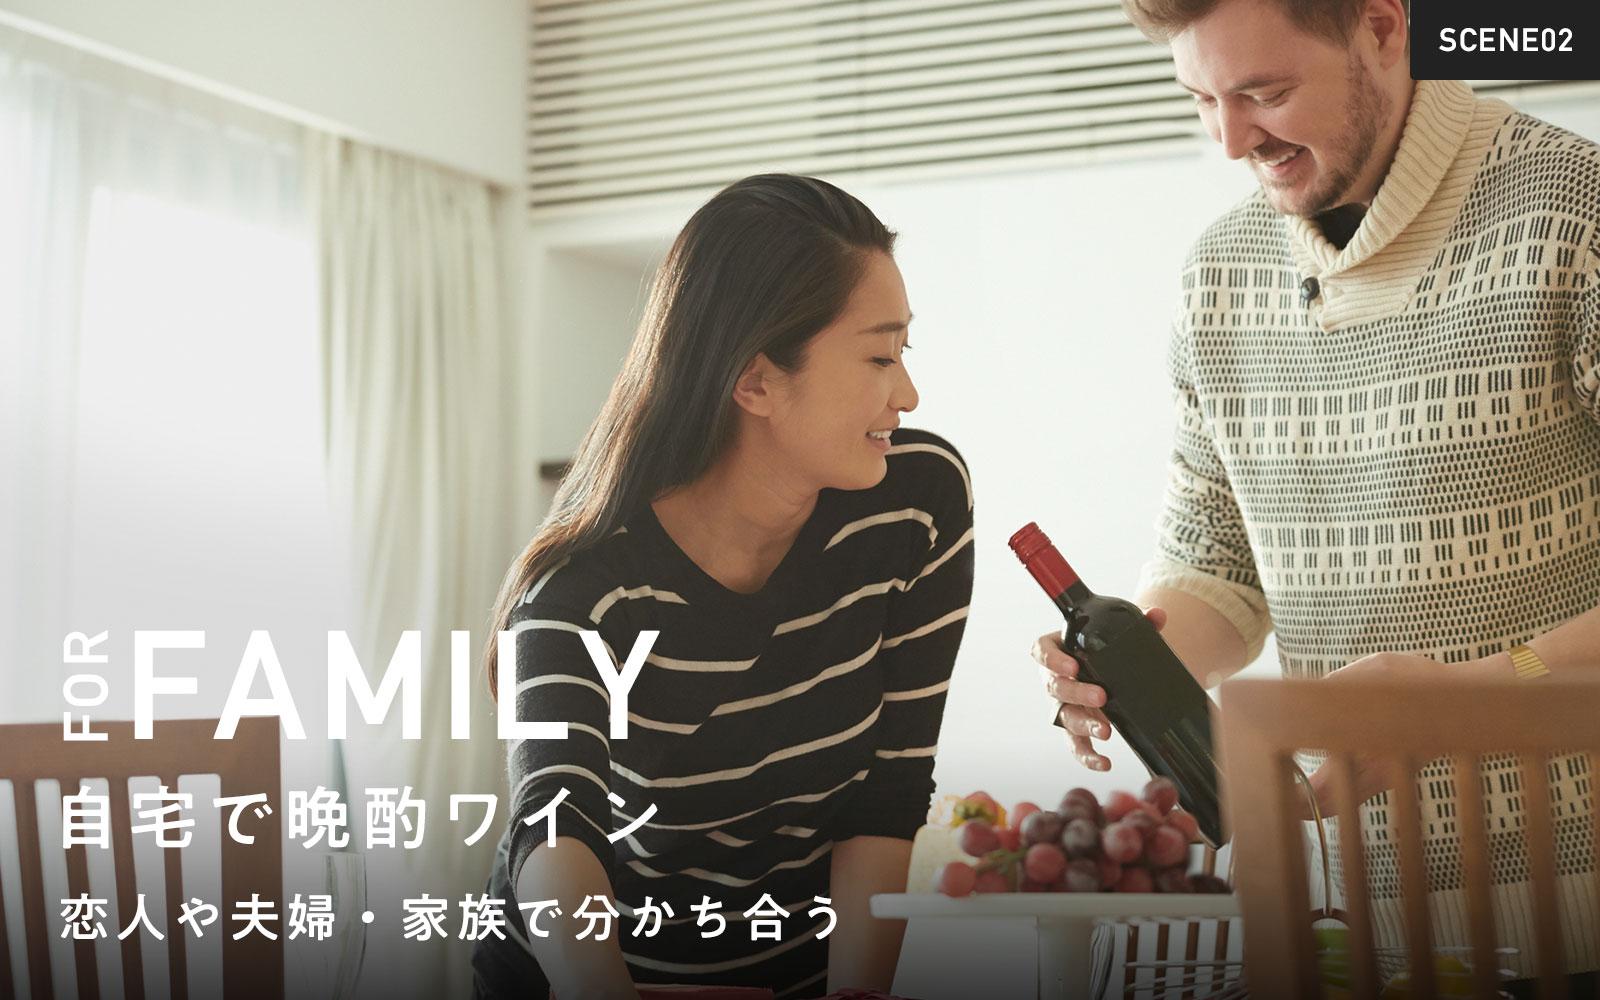 SCENE 02 自宅で晩酌ワイン 恋人や夫婦・家族で分かち合う